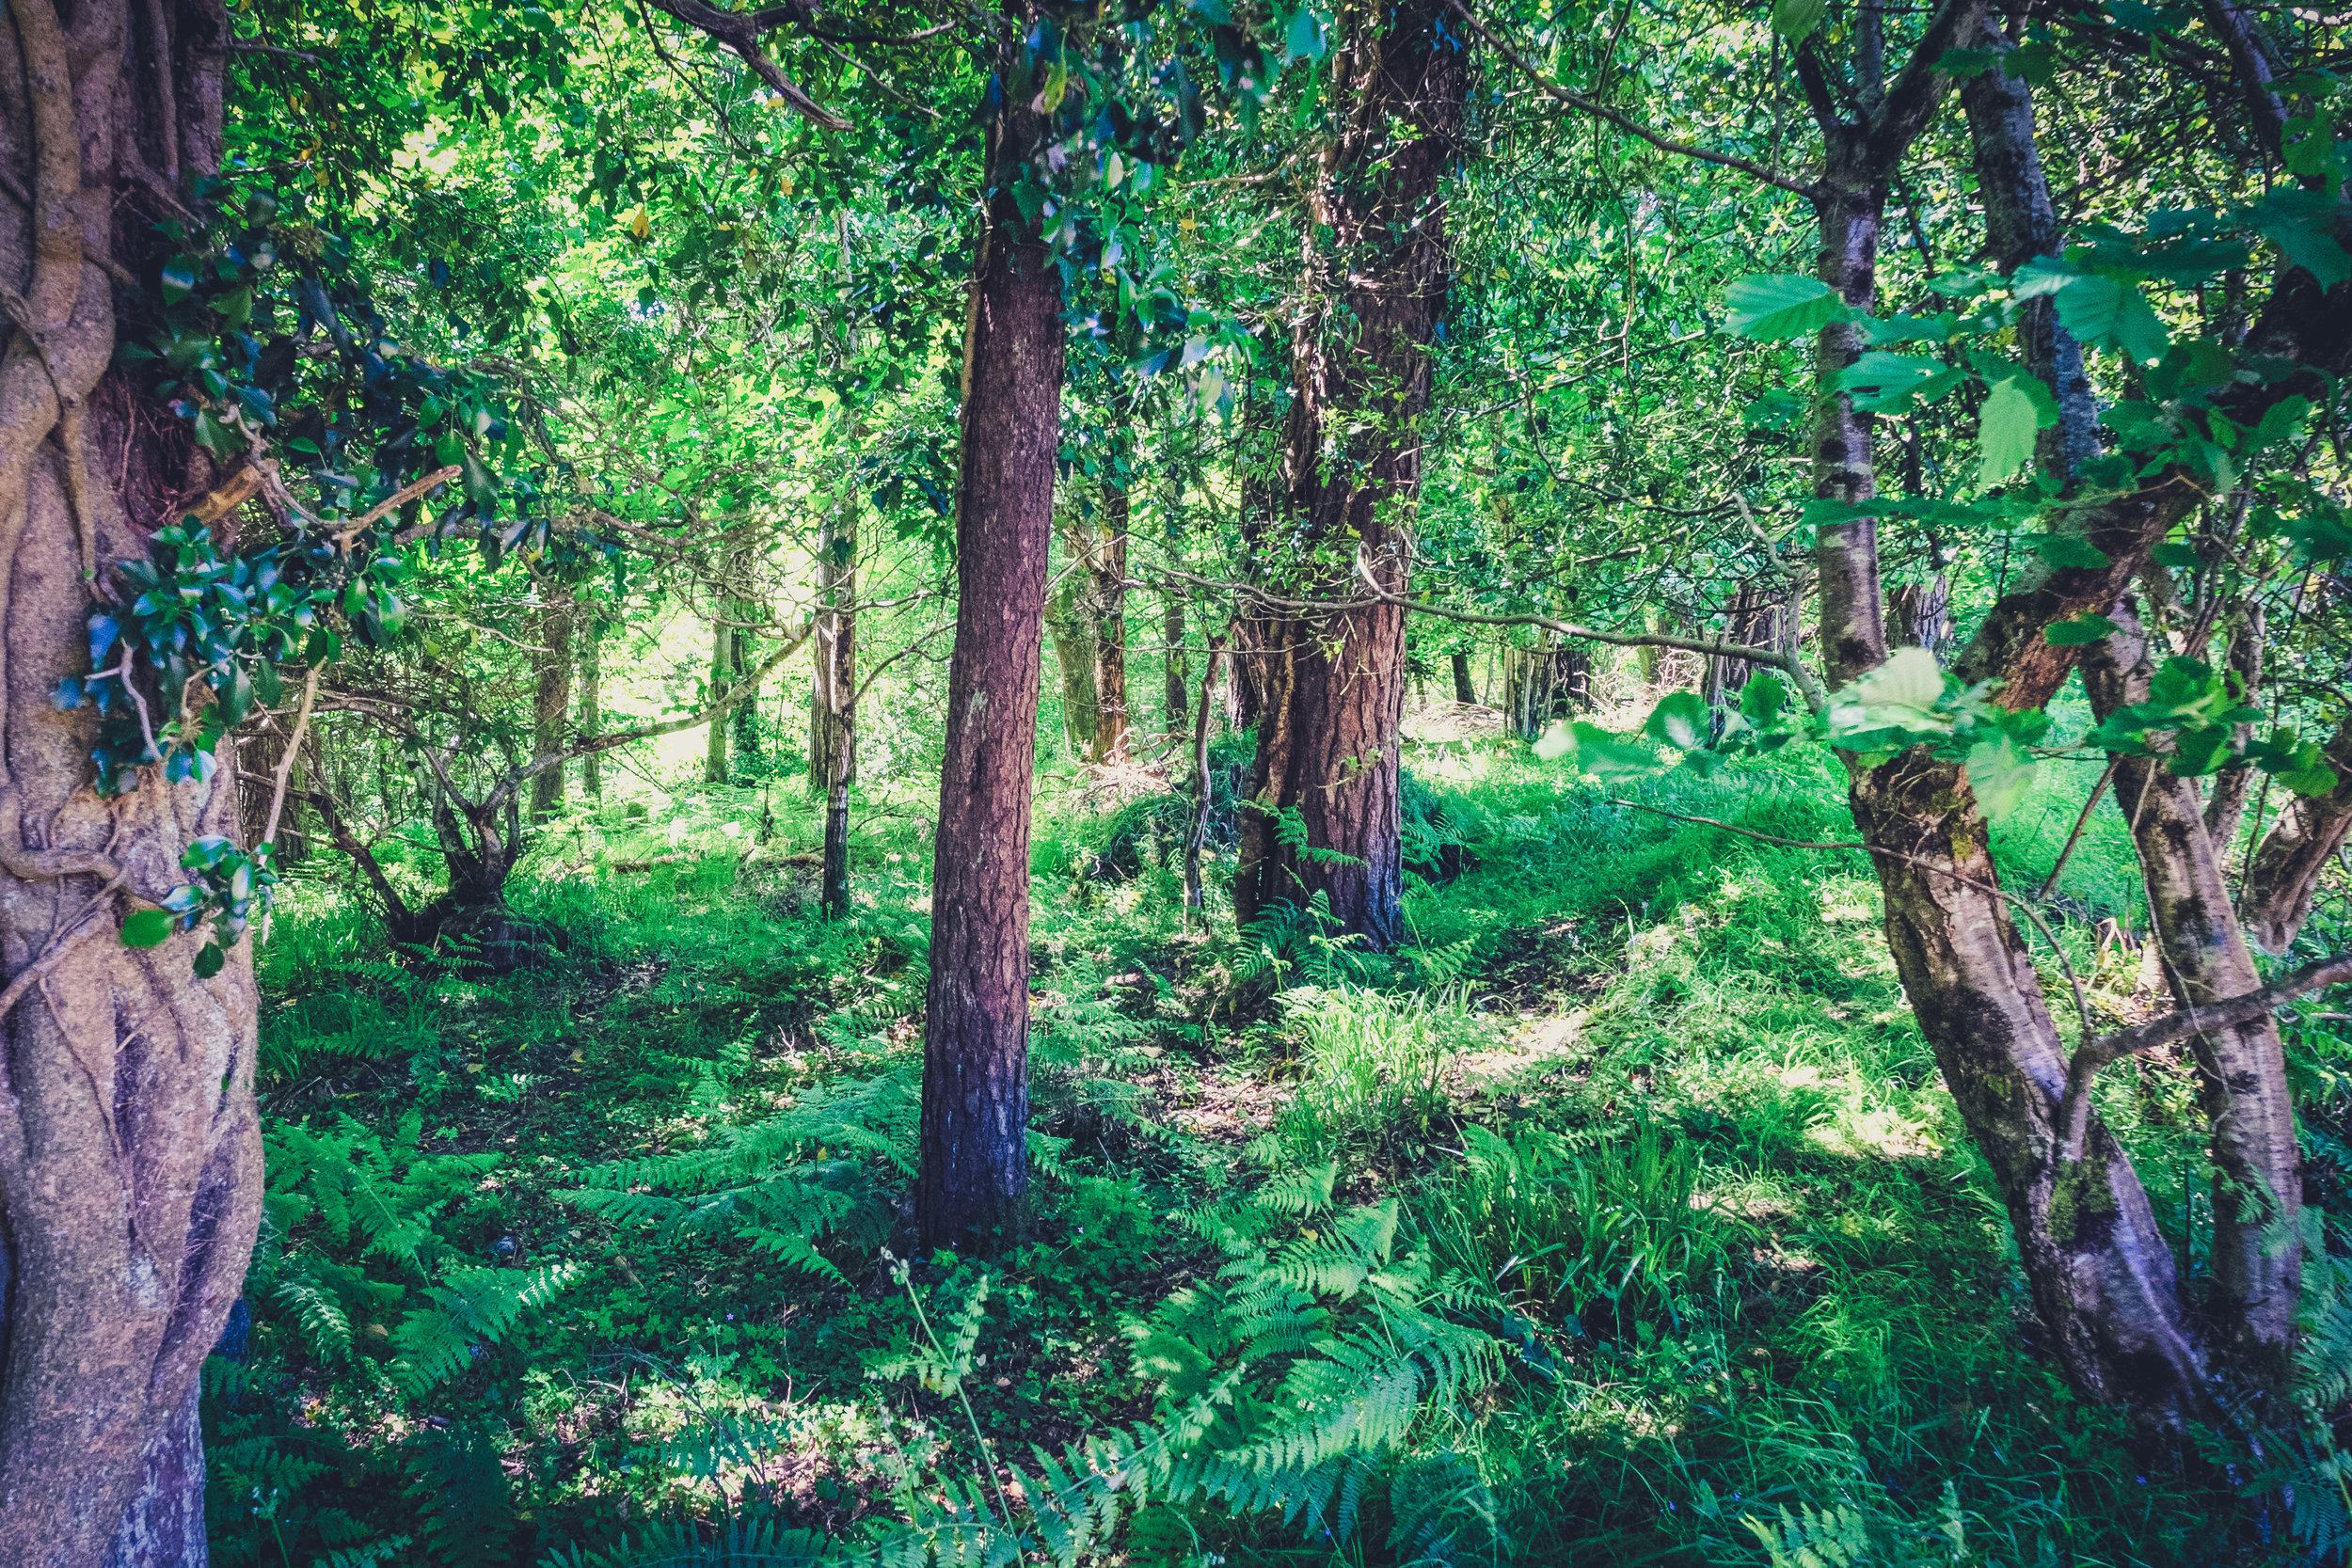 Vale of Clara. Walking in Wicklow. The garden of Ireland. Wicklow. Clara Vale. Ferns. Ireland. trees. forest..jpg